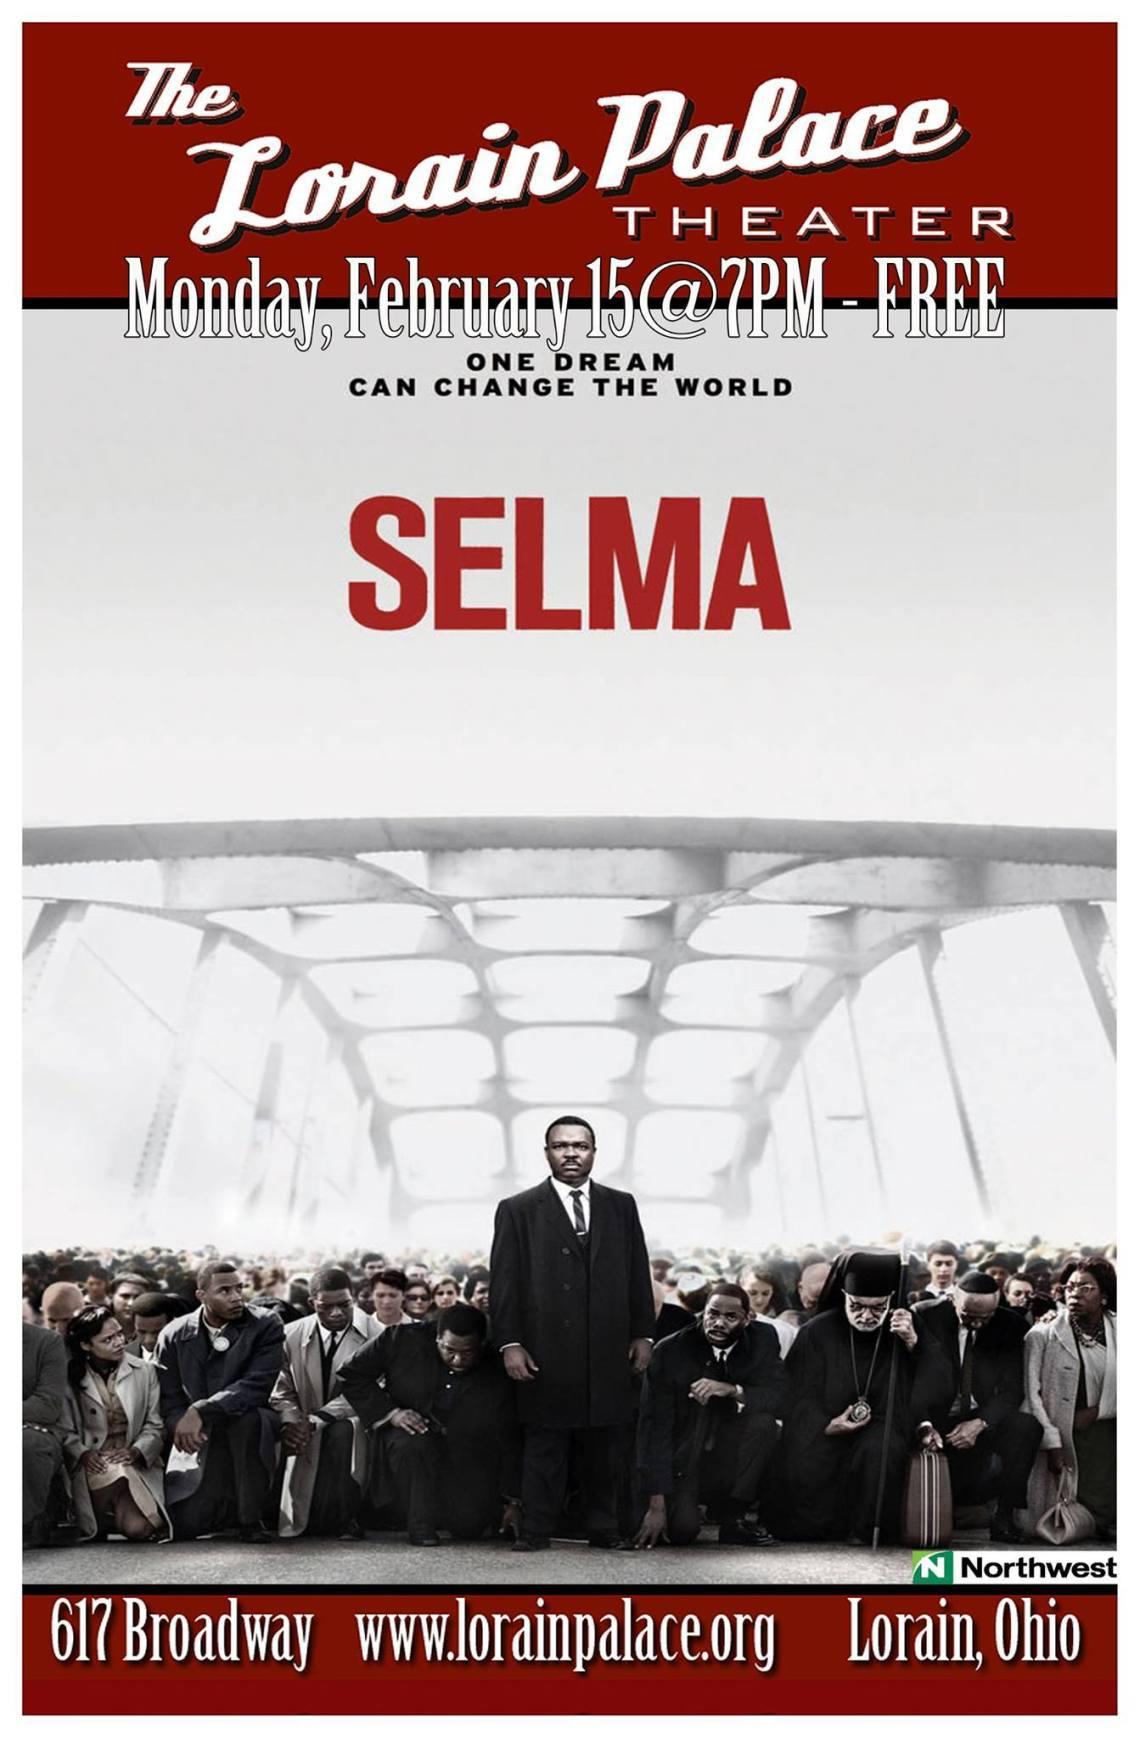 021516 selma movie